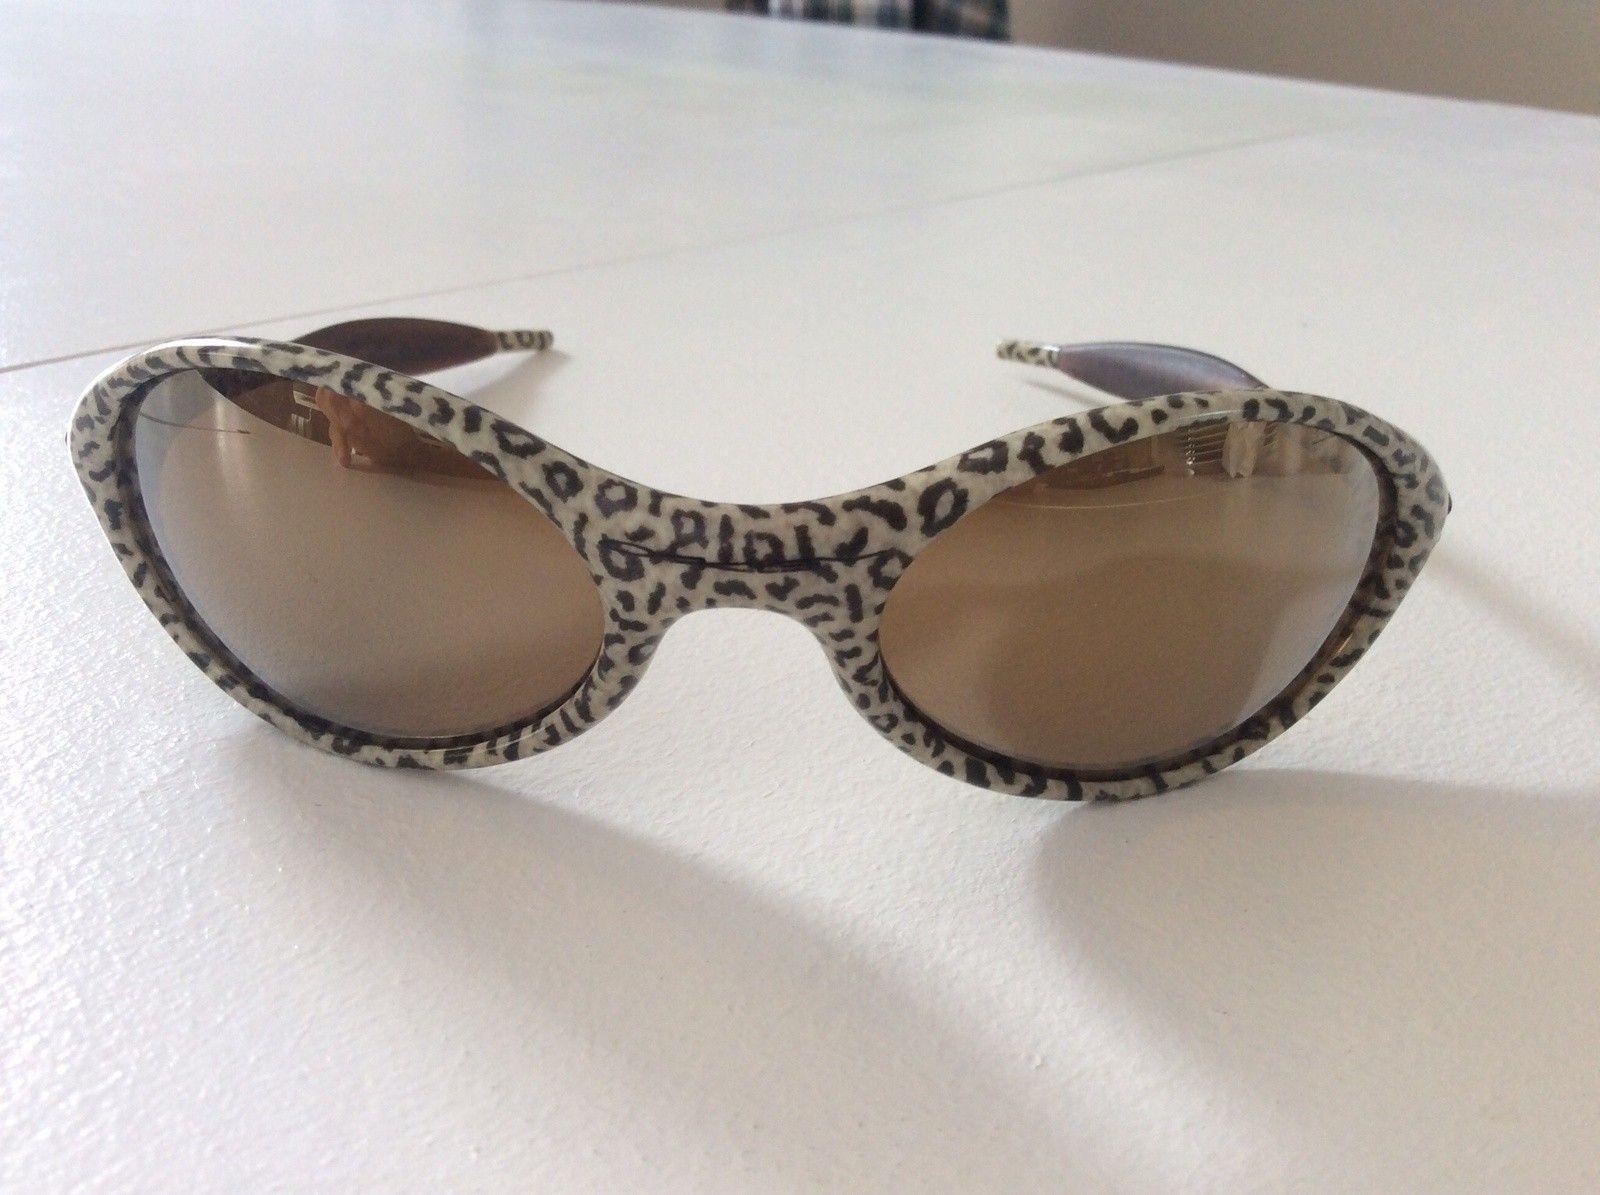 Eye Jackets - Cheetah, Fingerprint & Carmel (New EJ - boxed) - image.jpg